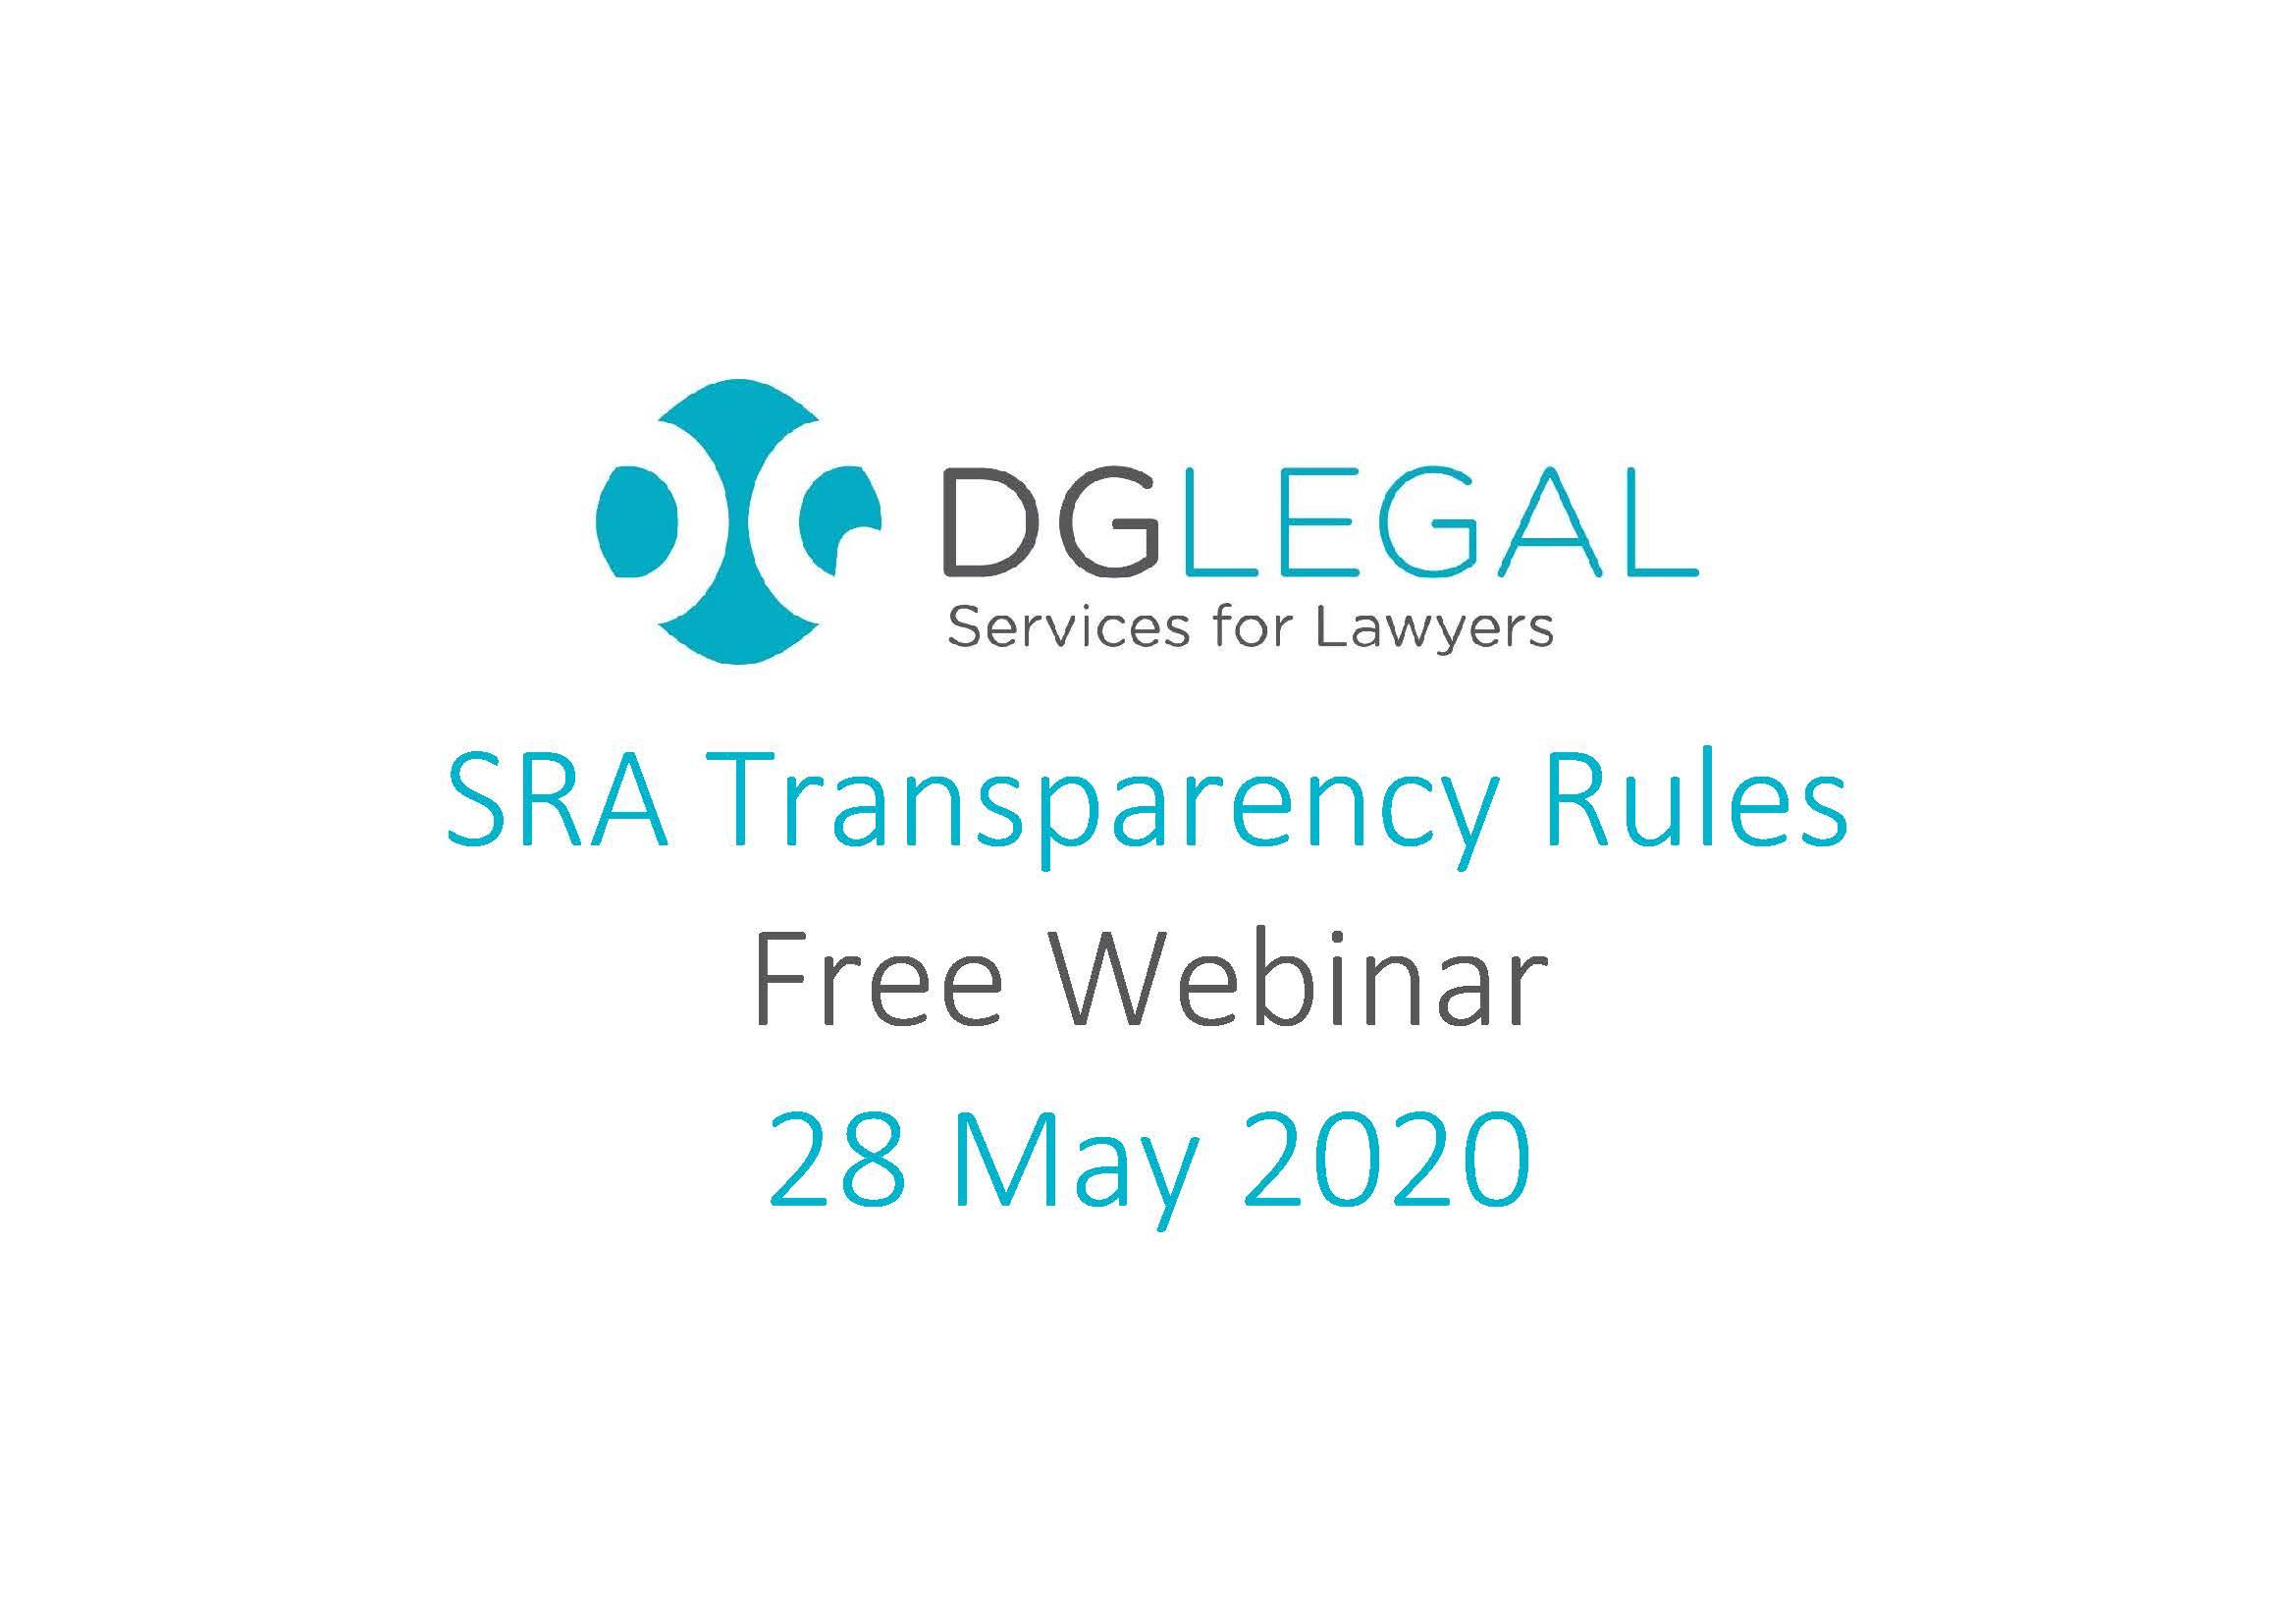 SRA Transparency Rules Webinar